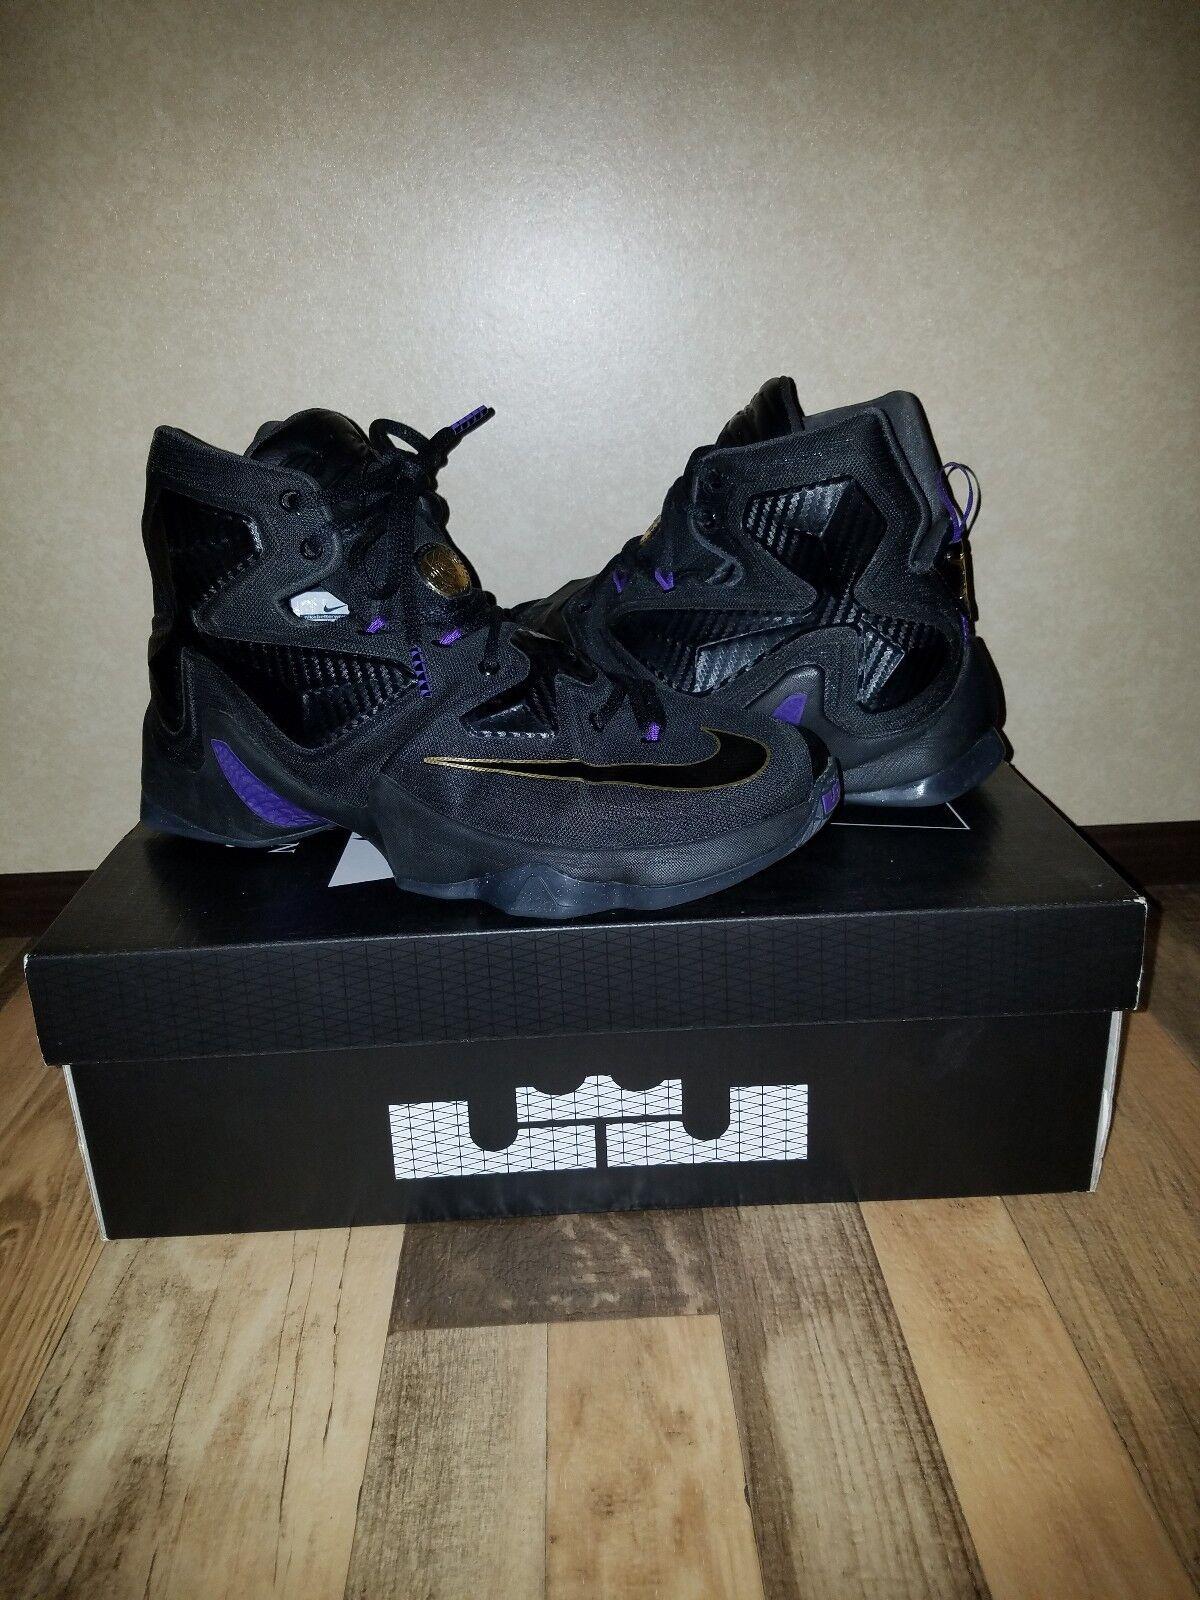 Nike Lebron XIII 13 Pot Of gold Size 9.5